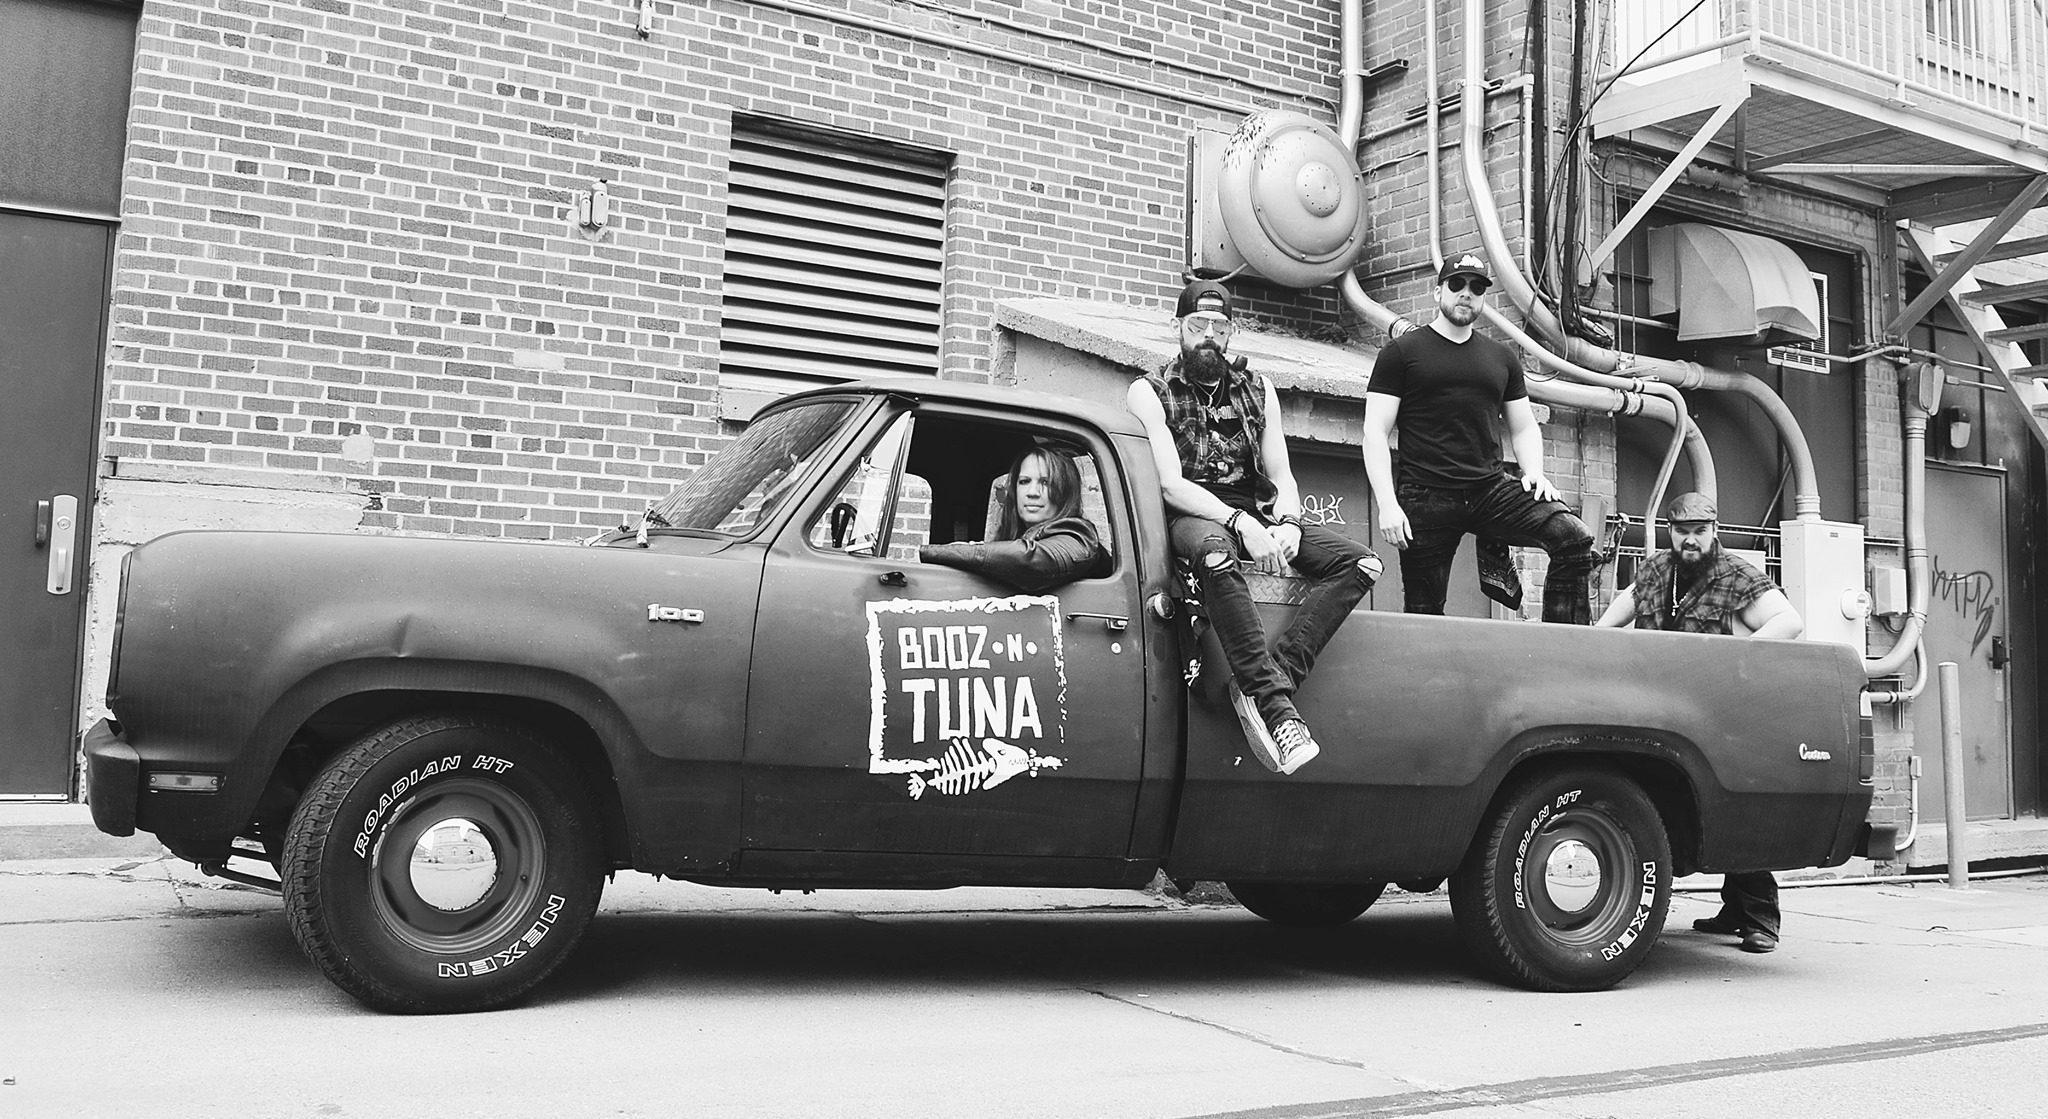 Booz N Tuna Live